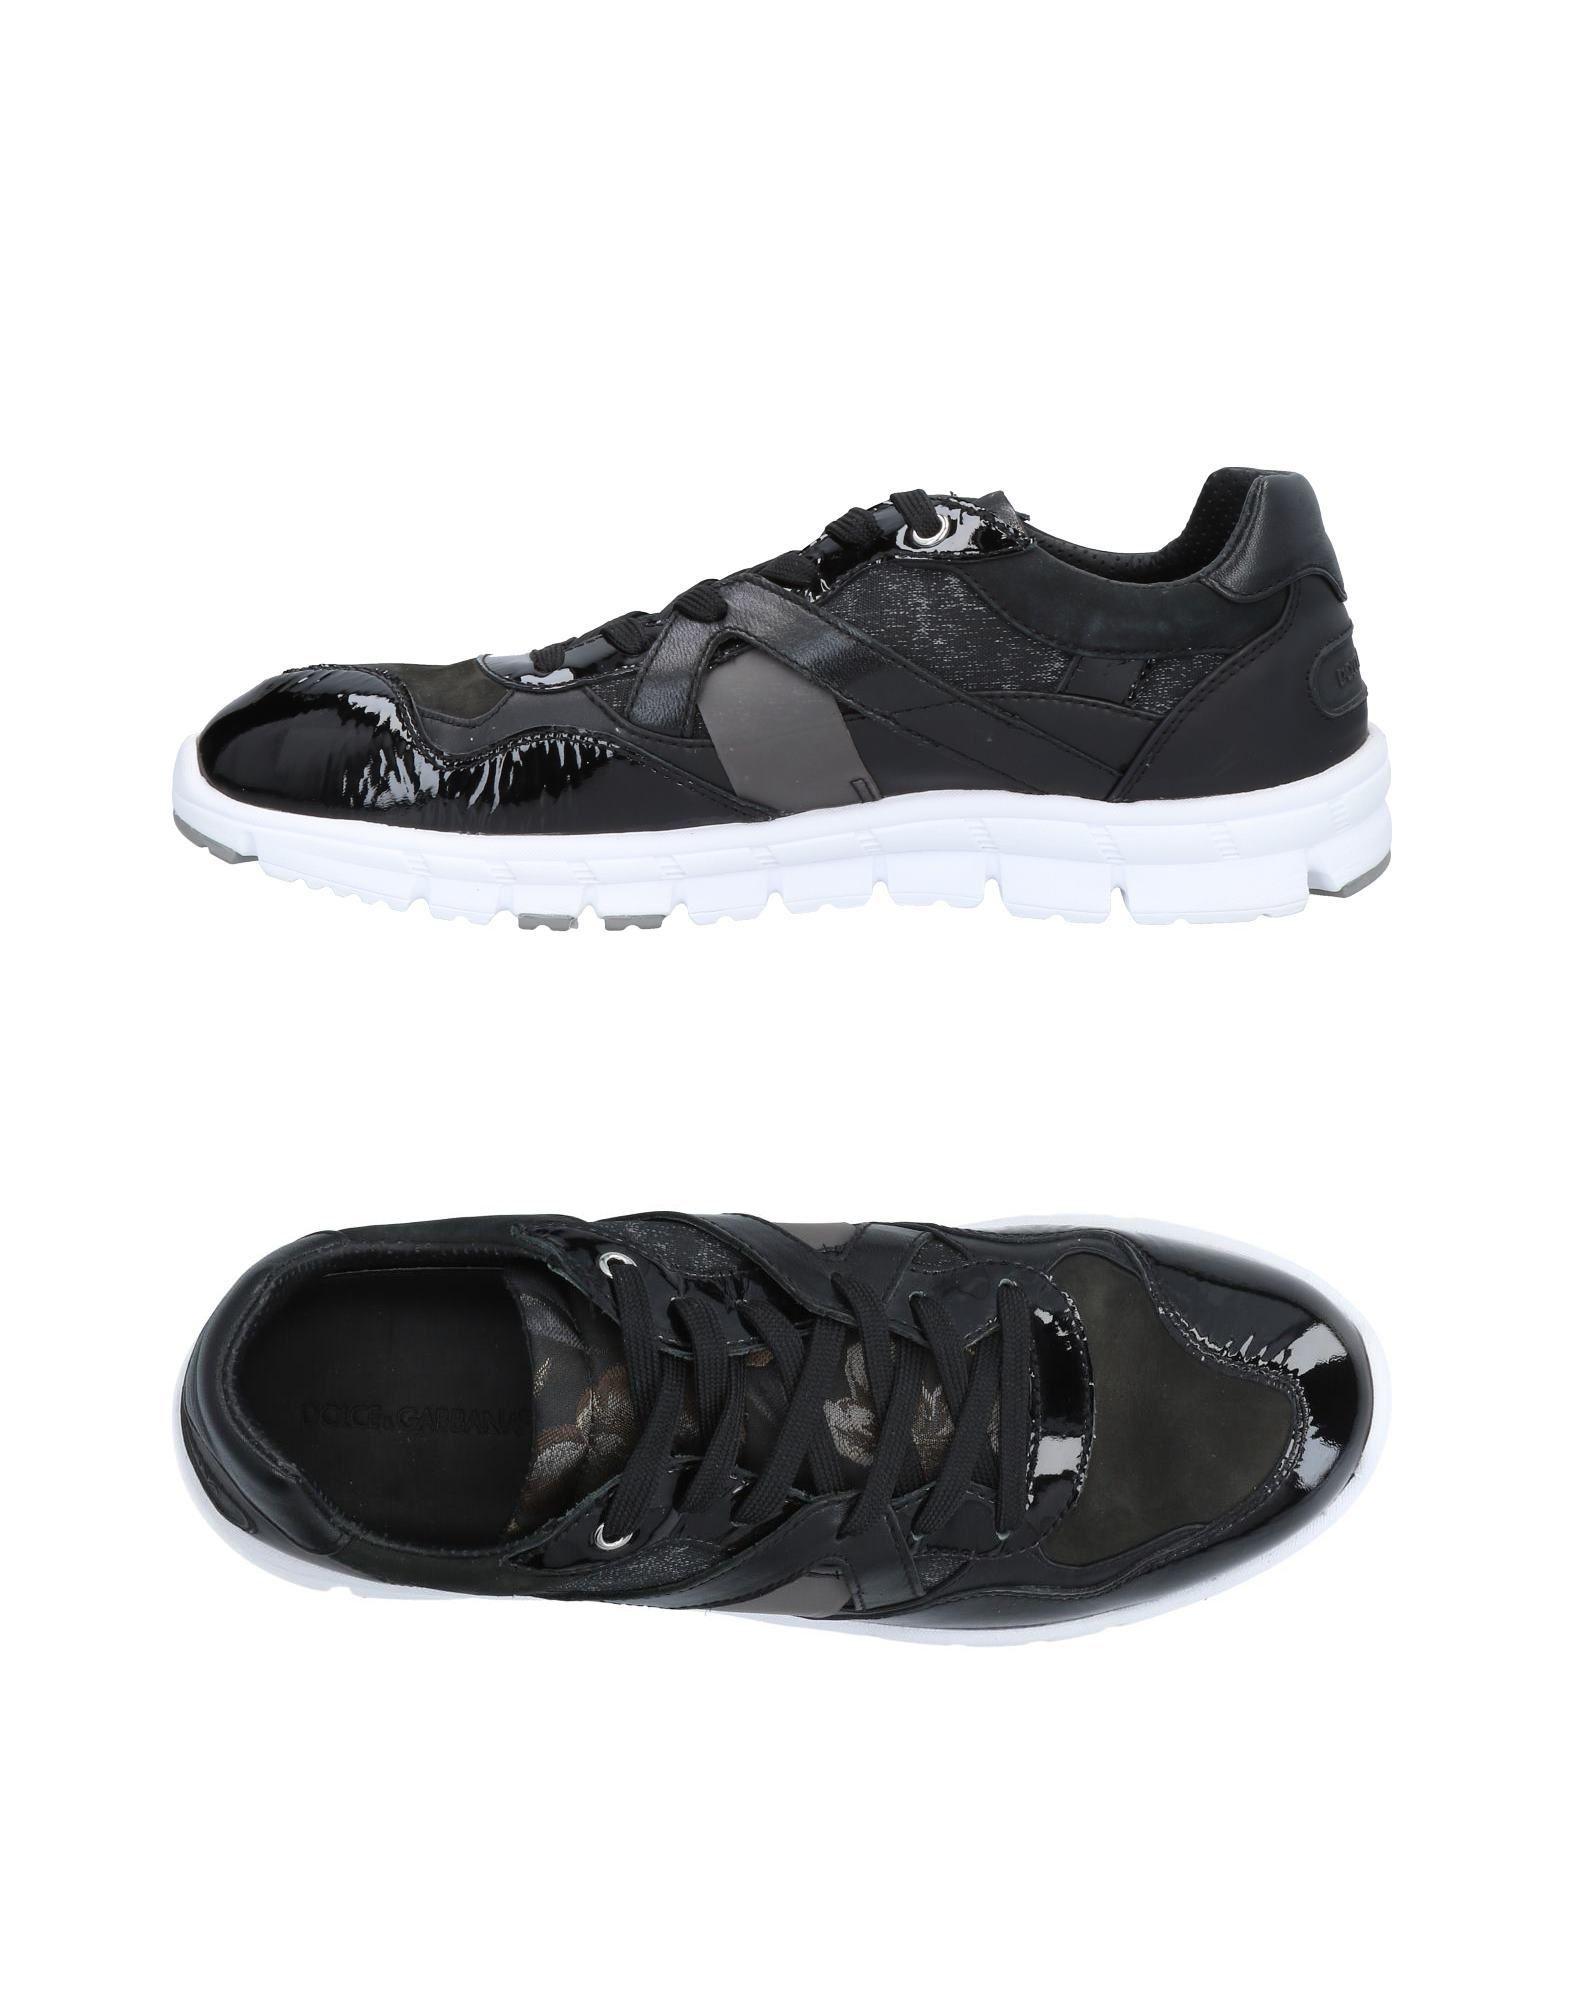 Dolce & Gabbana Sneakers Herren  11473650TI Gute Qualität beliebte Schuhe